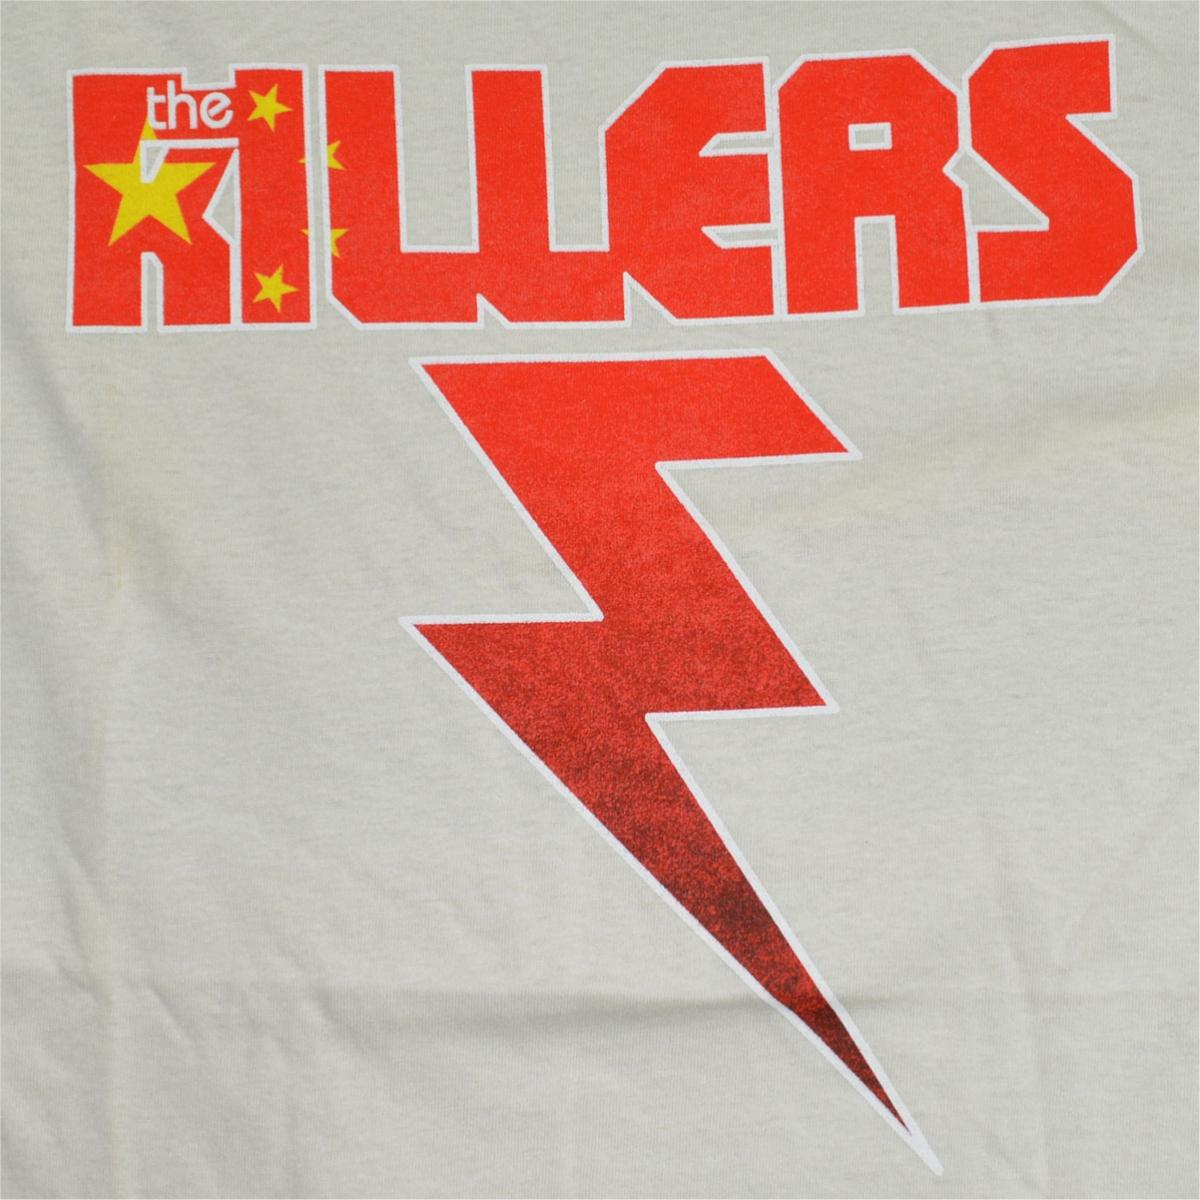 KILLERS5